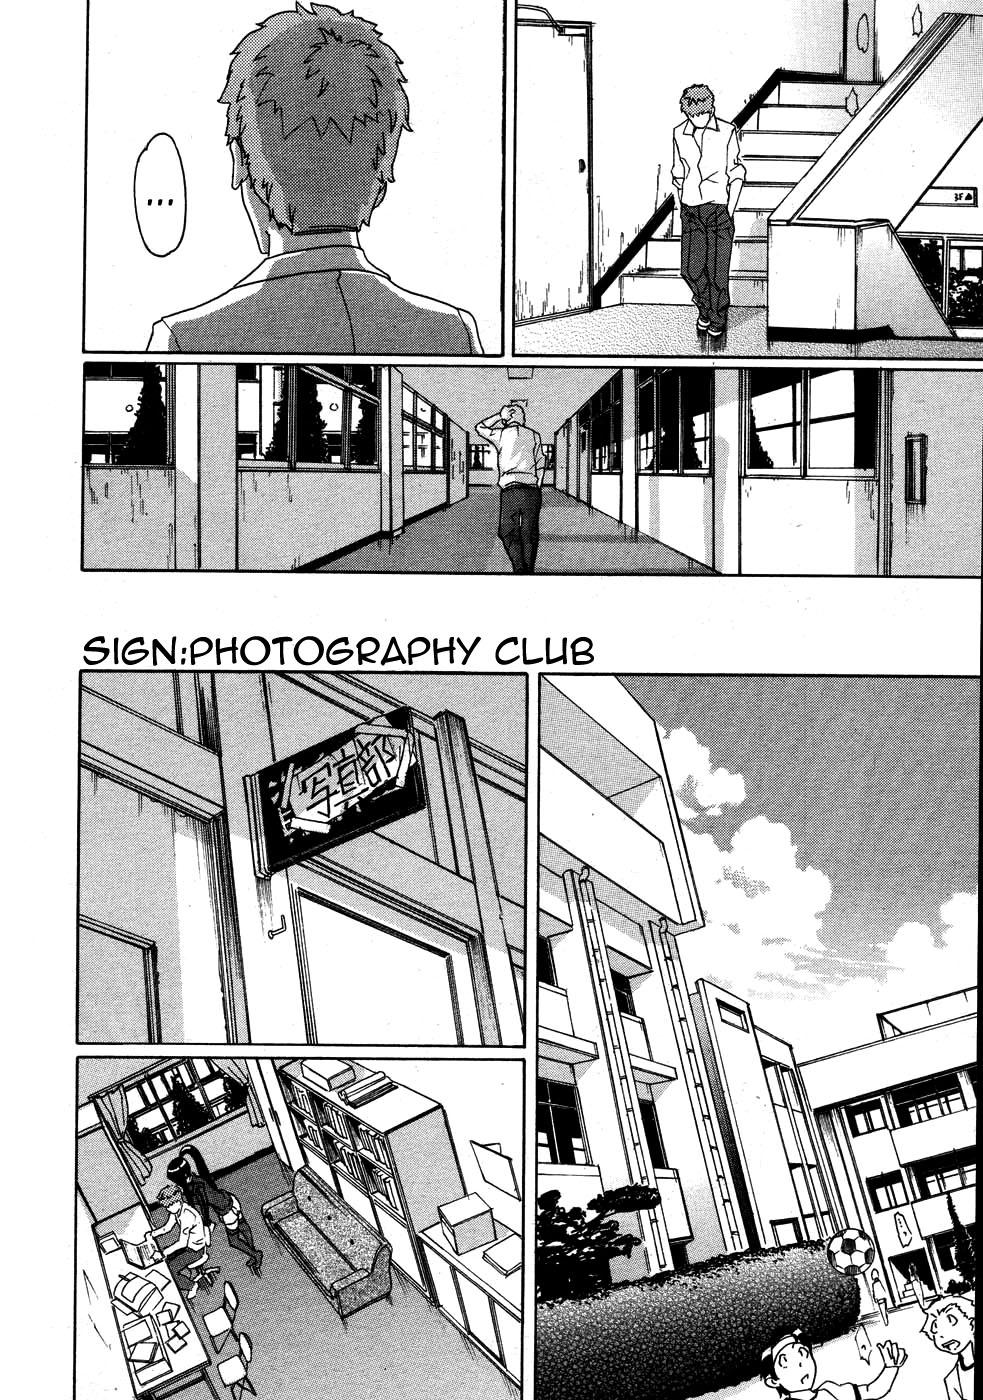 [Royal Koyanagi] Milky Shot! (School Is Crazy these Days) Ch.1-2 [English] 11